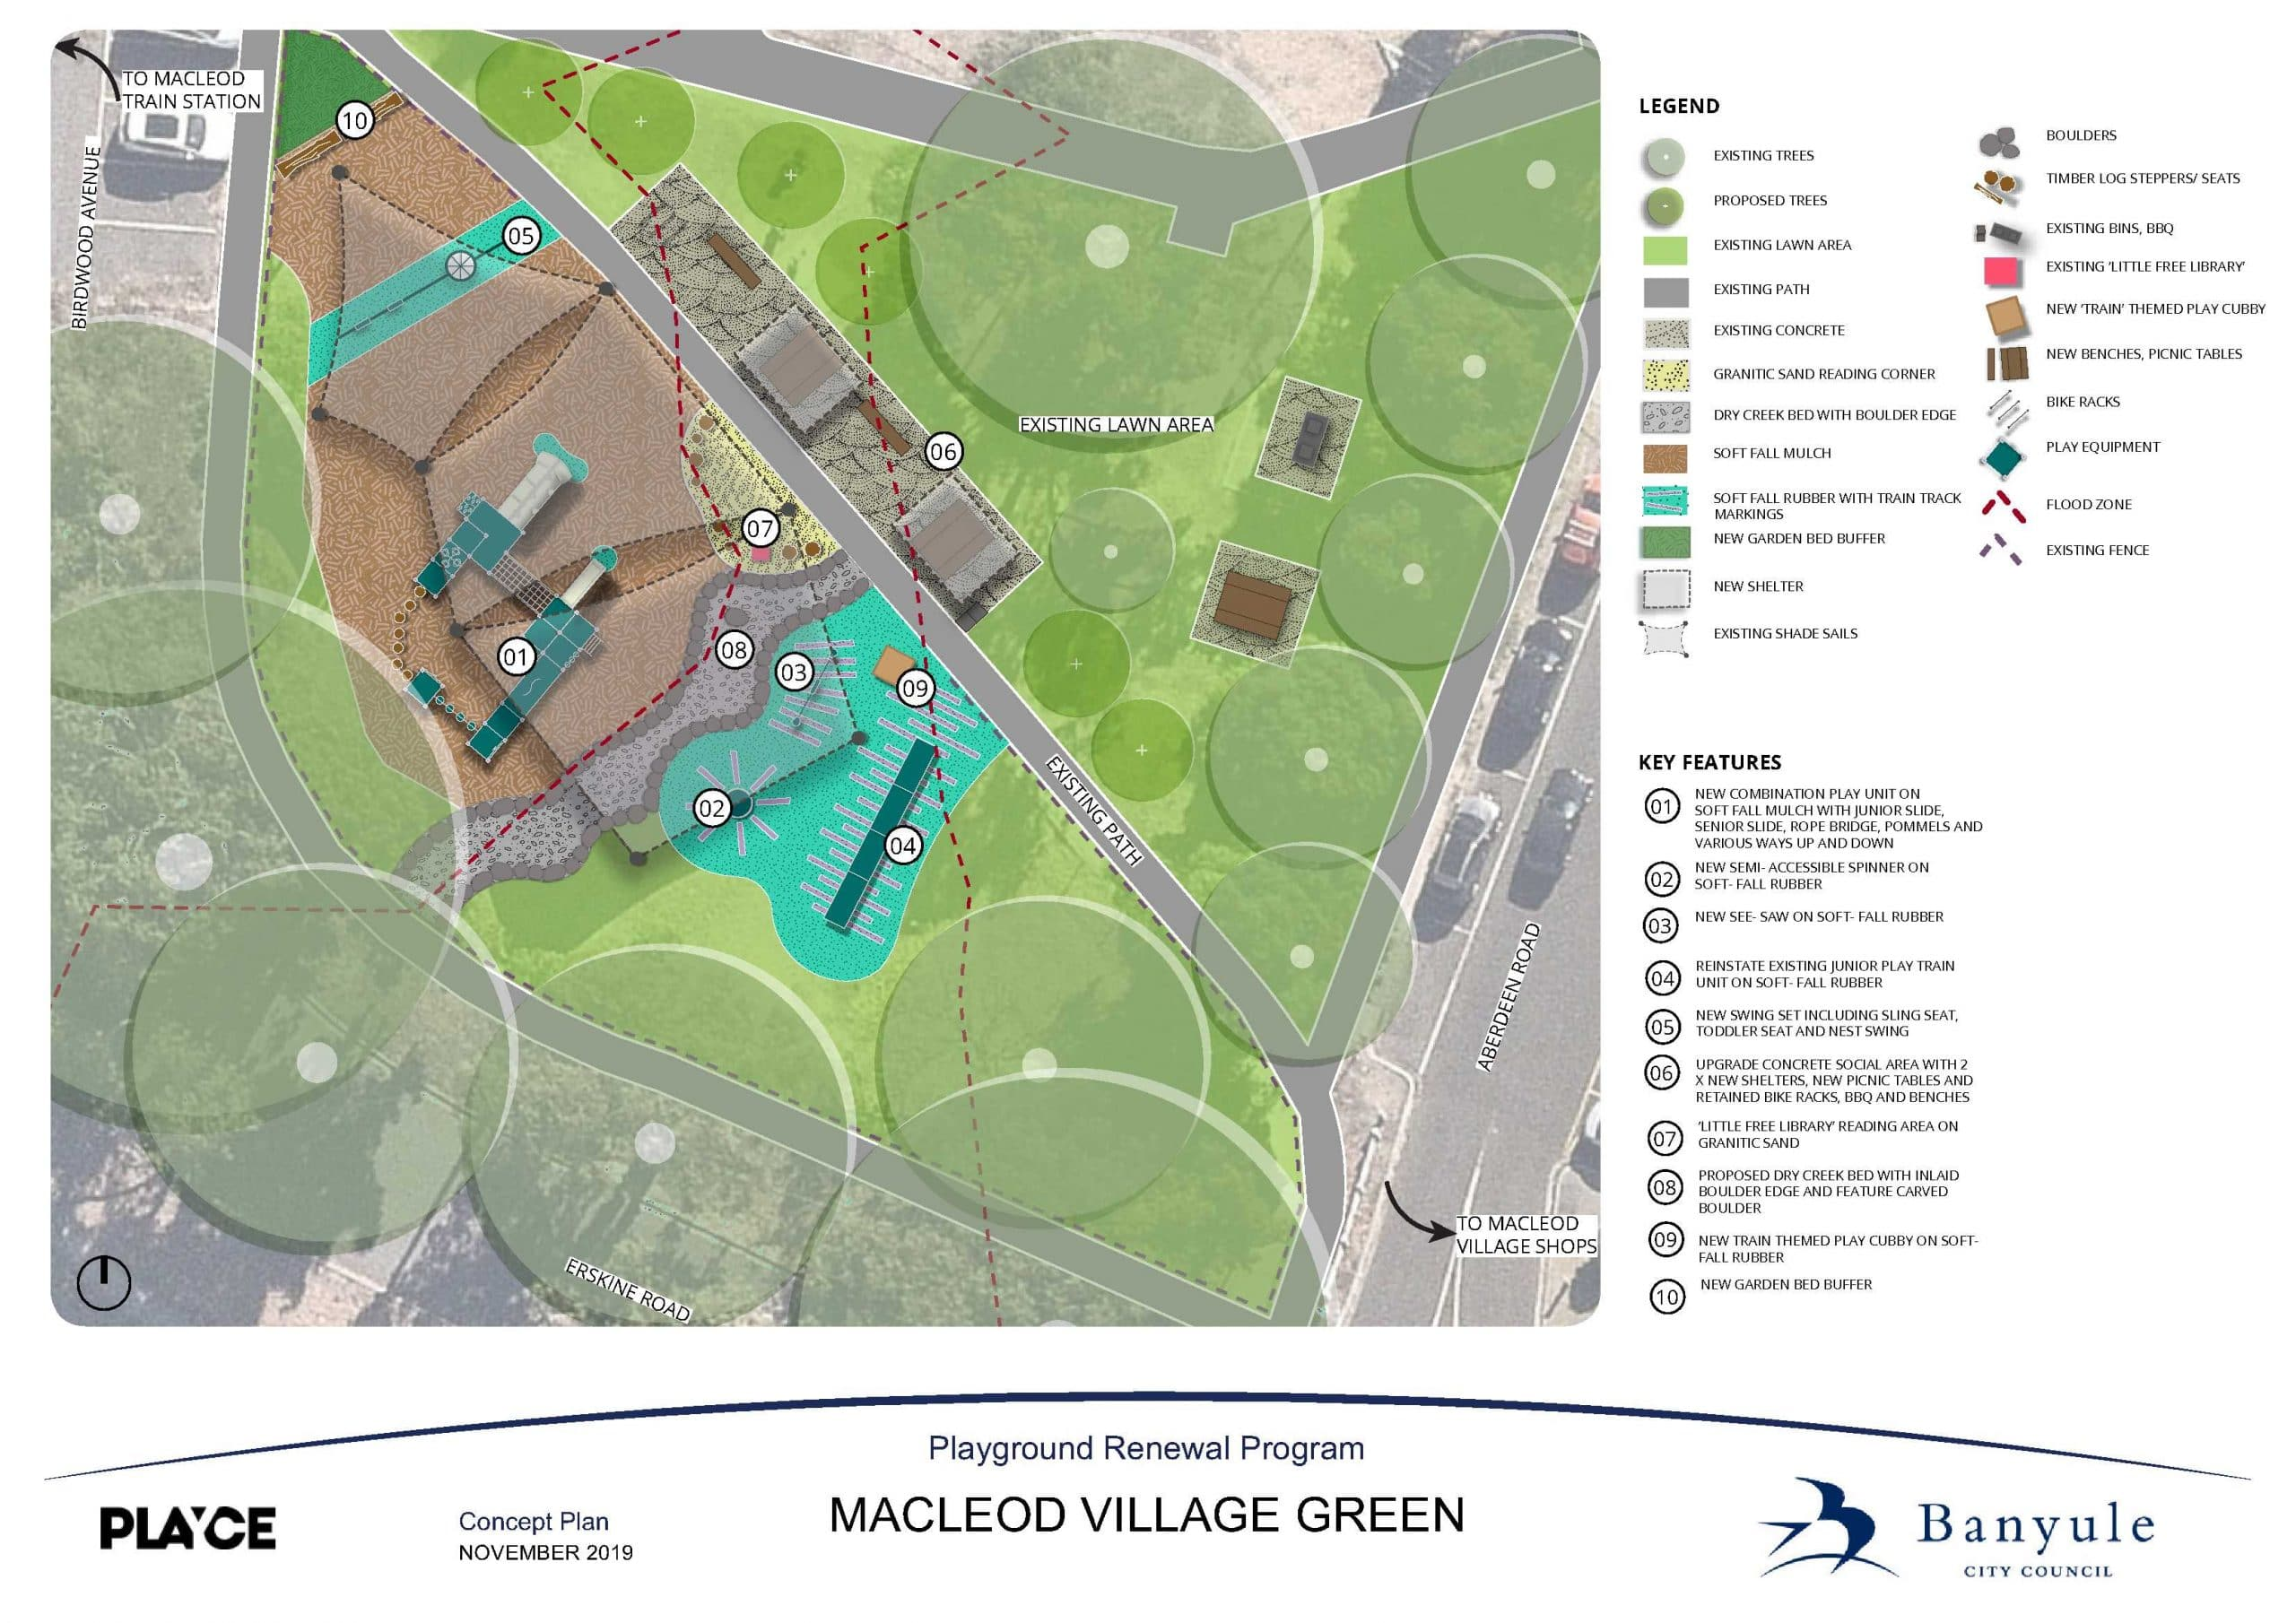 Macleod Village Green